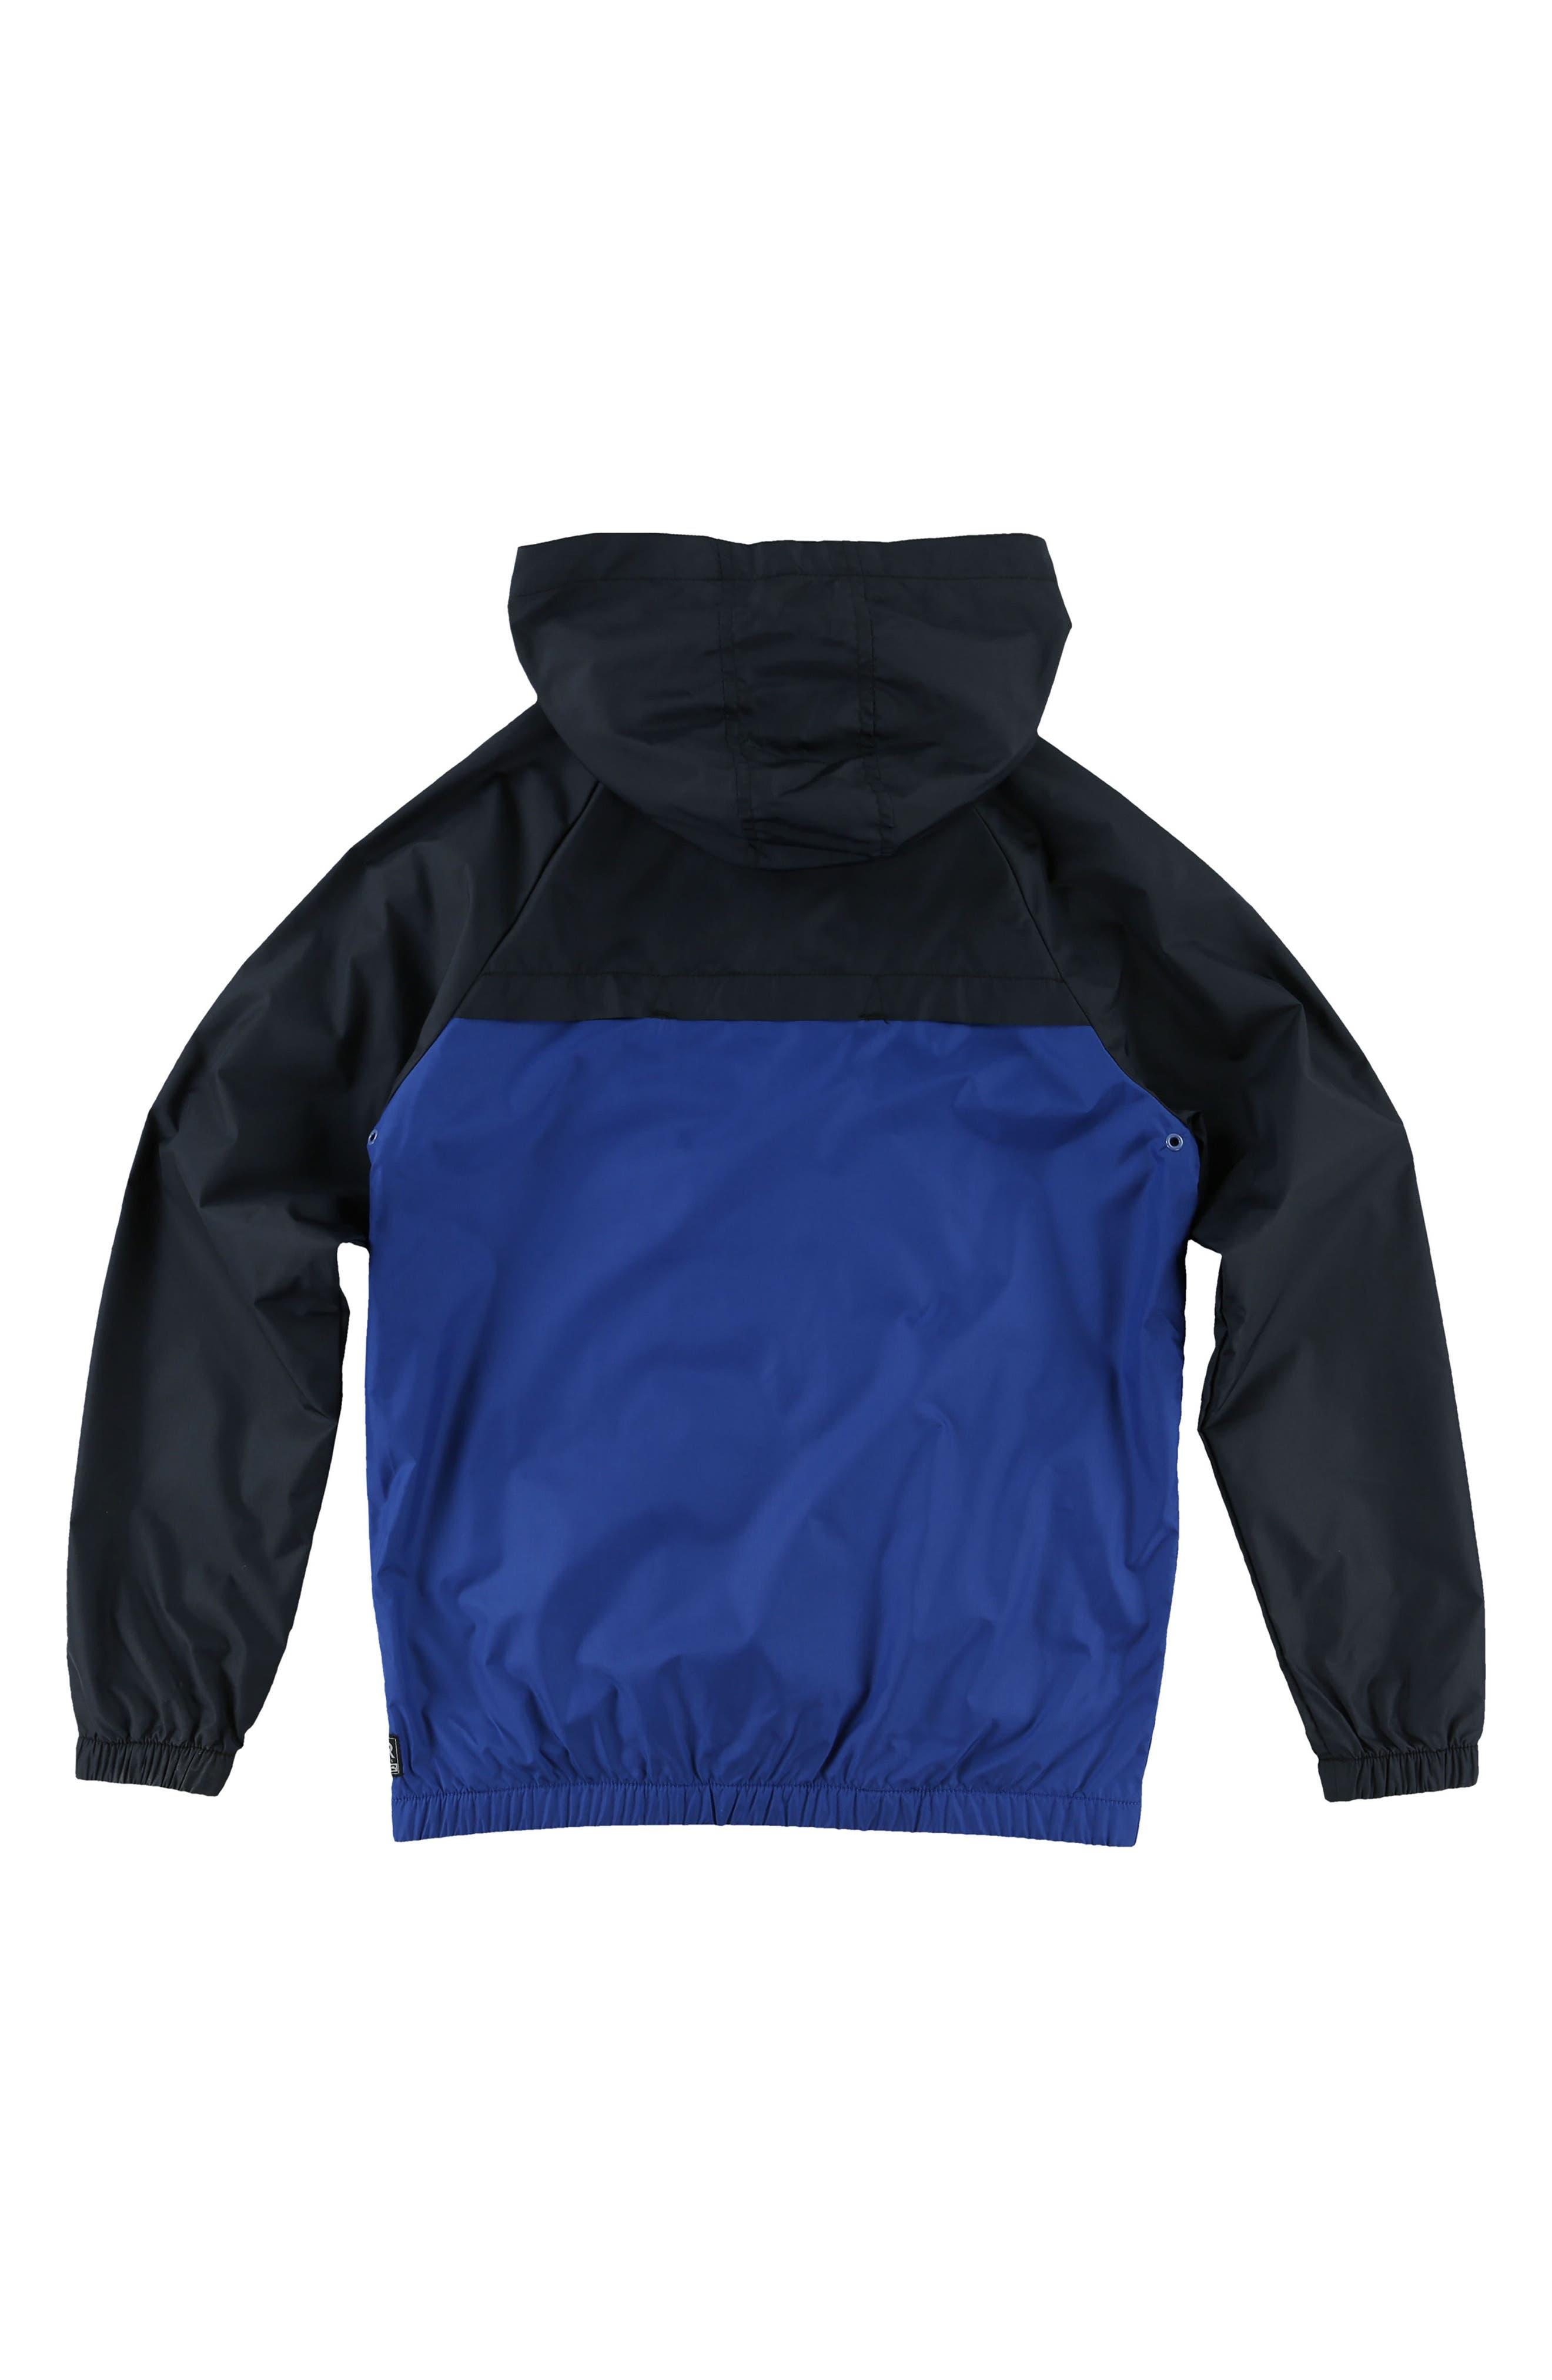 Alternate Image 2  - O'Neill Traveler Packable Windbreaker Jacket (Big Boys)